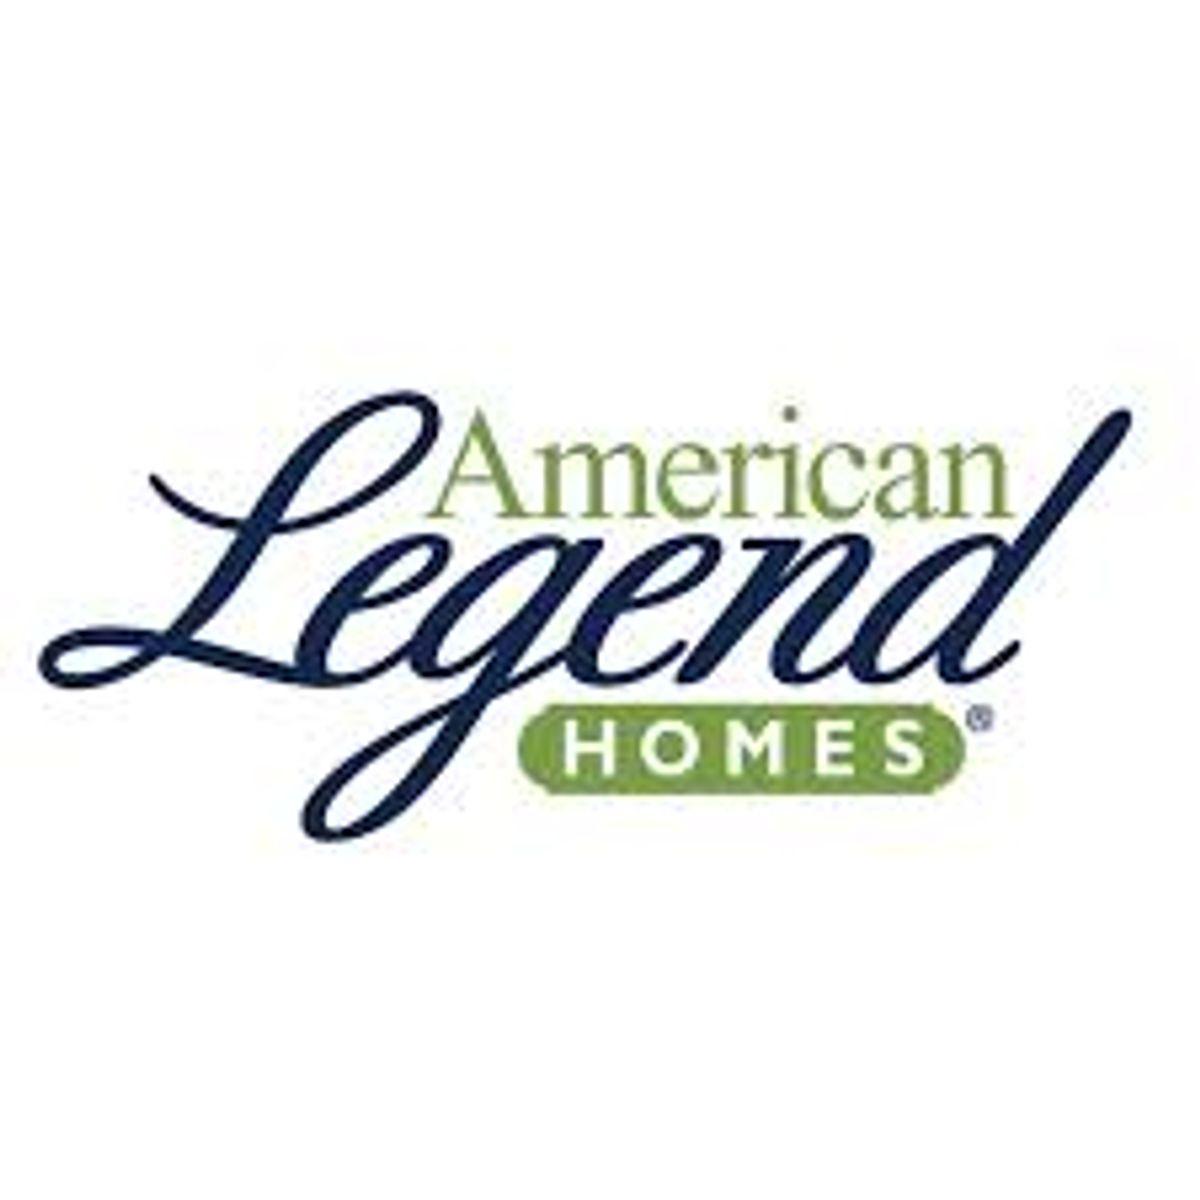 New website, same great American Legend Homes